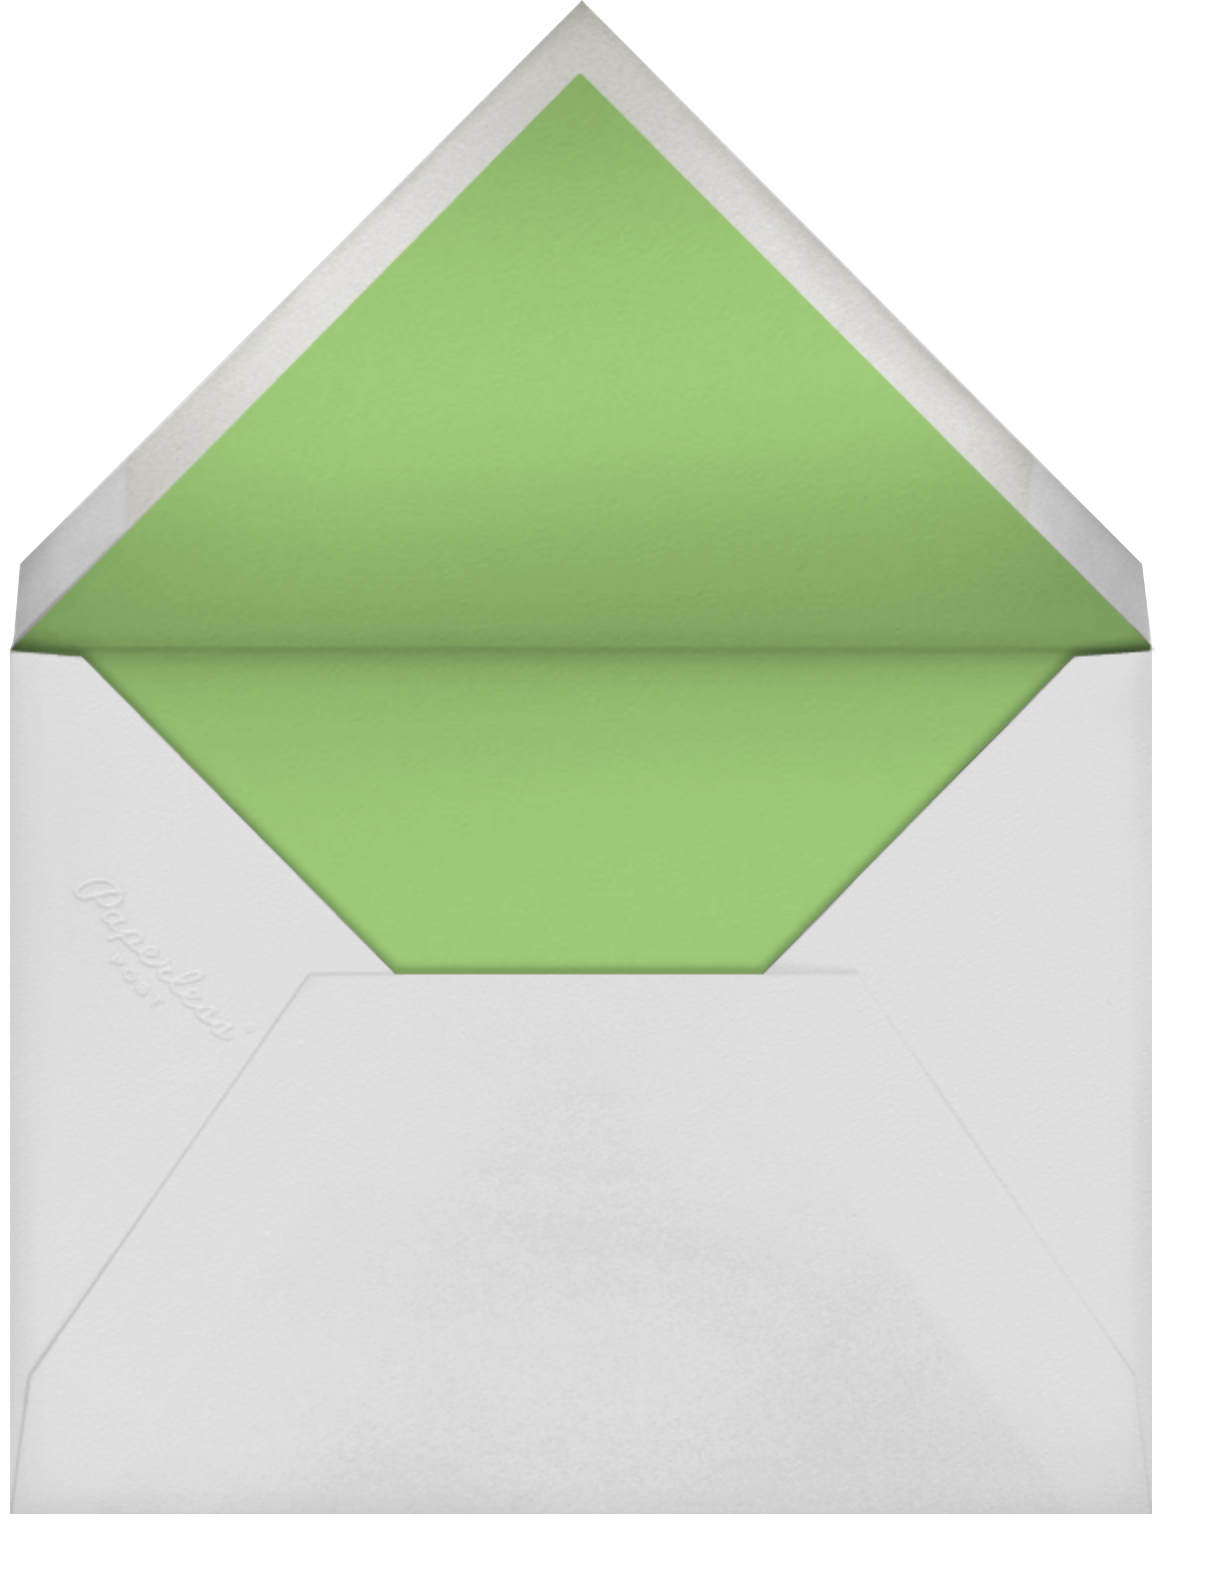 Holiday Baronial - kate spade new york - Holiday cards - envelope back